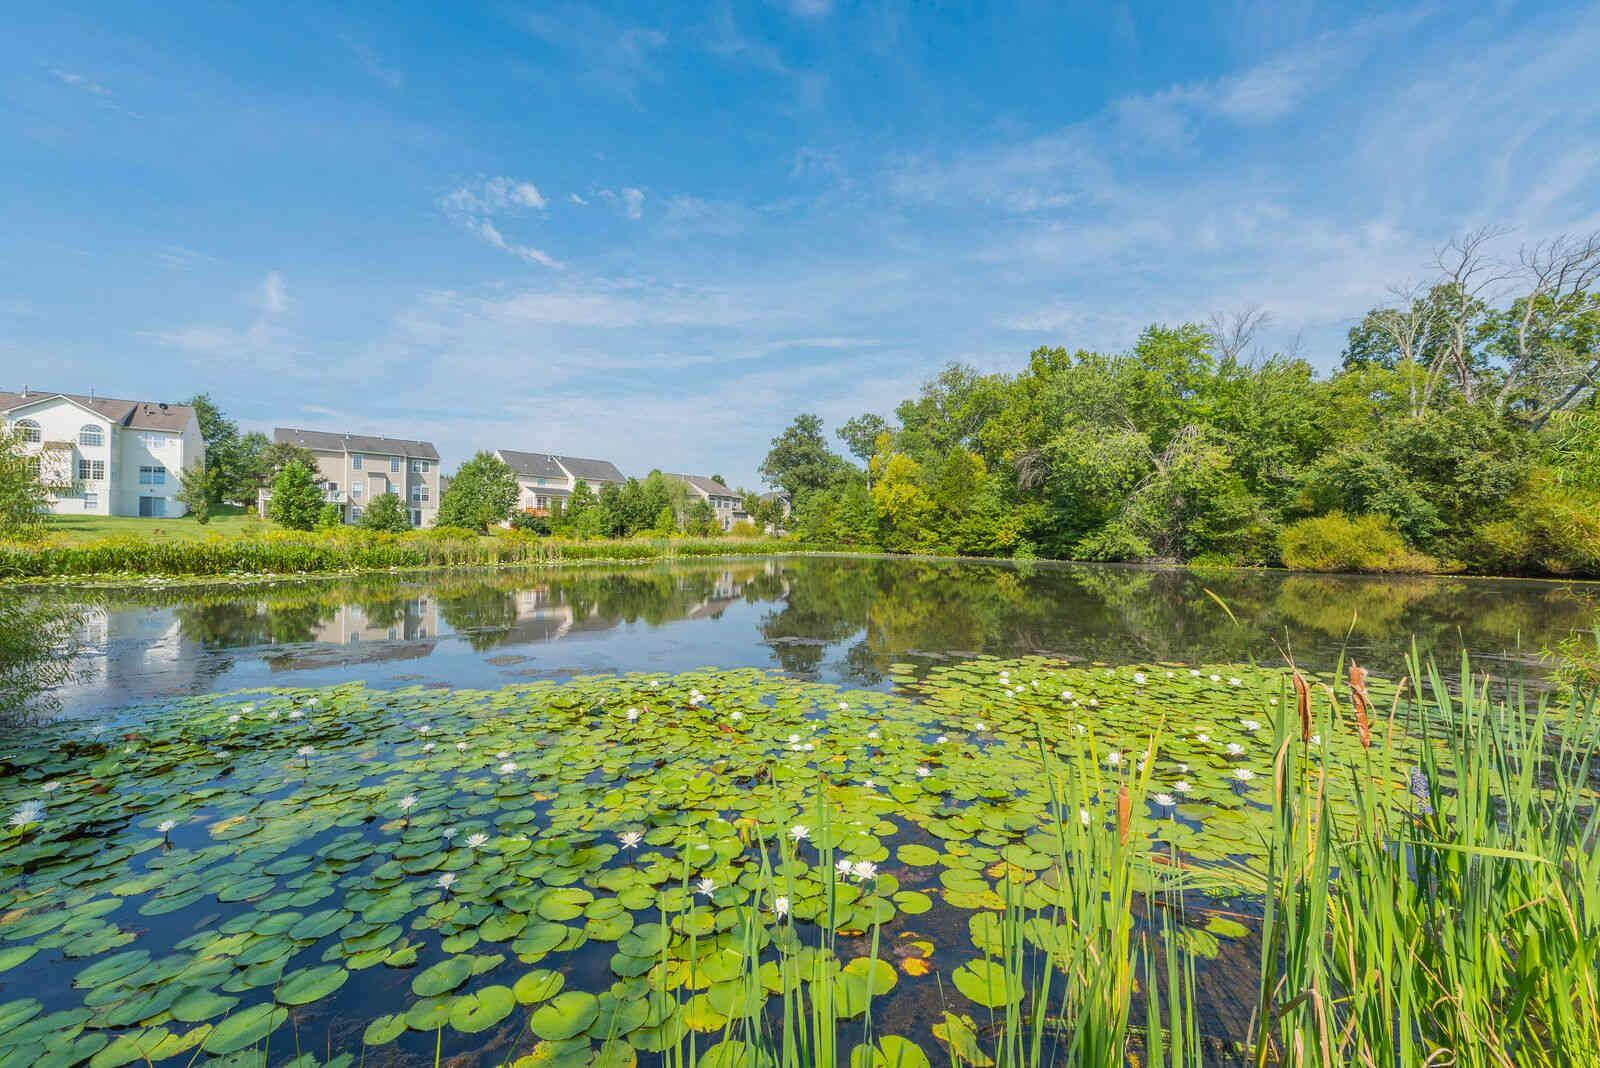 The Pond at Carisbrooke HOA